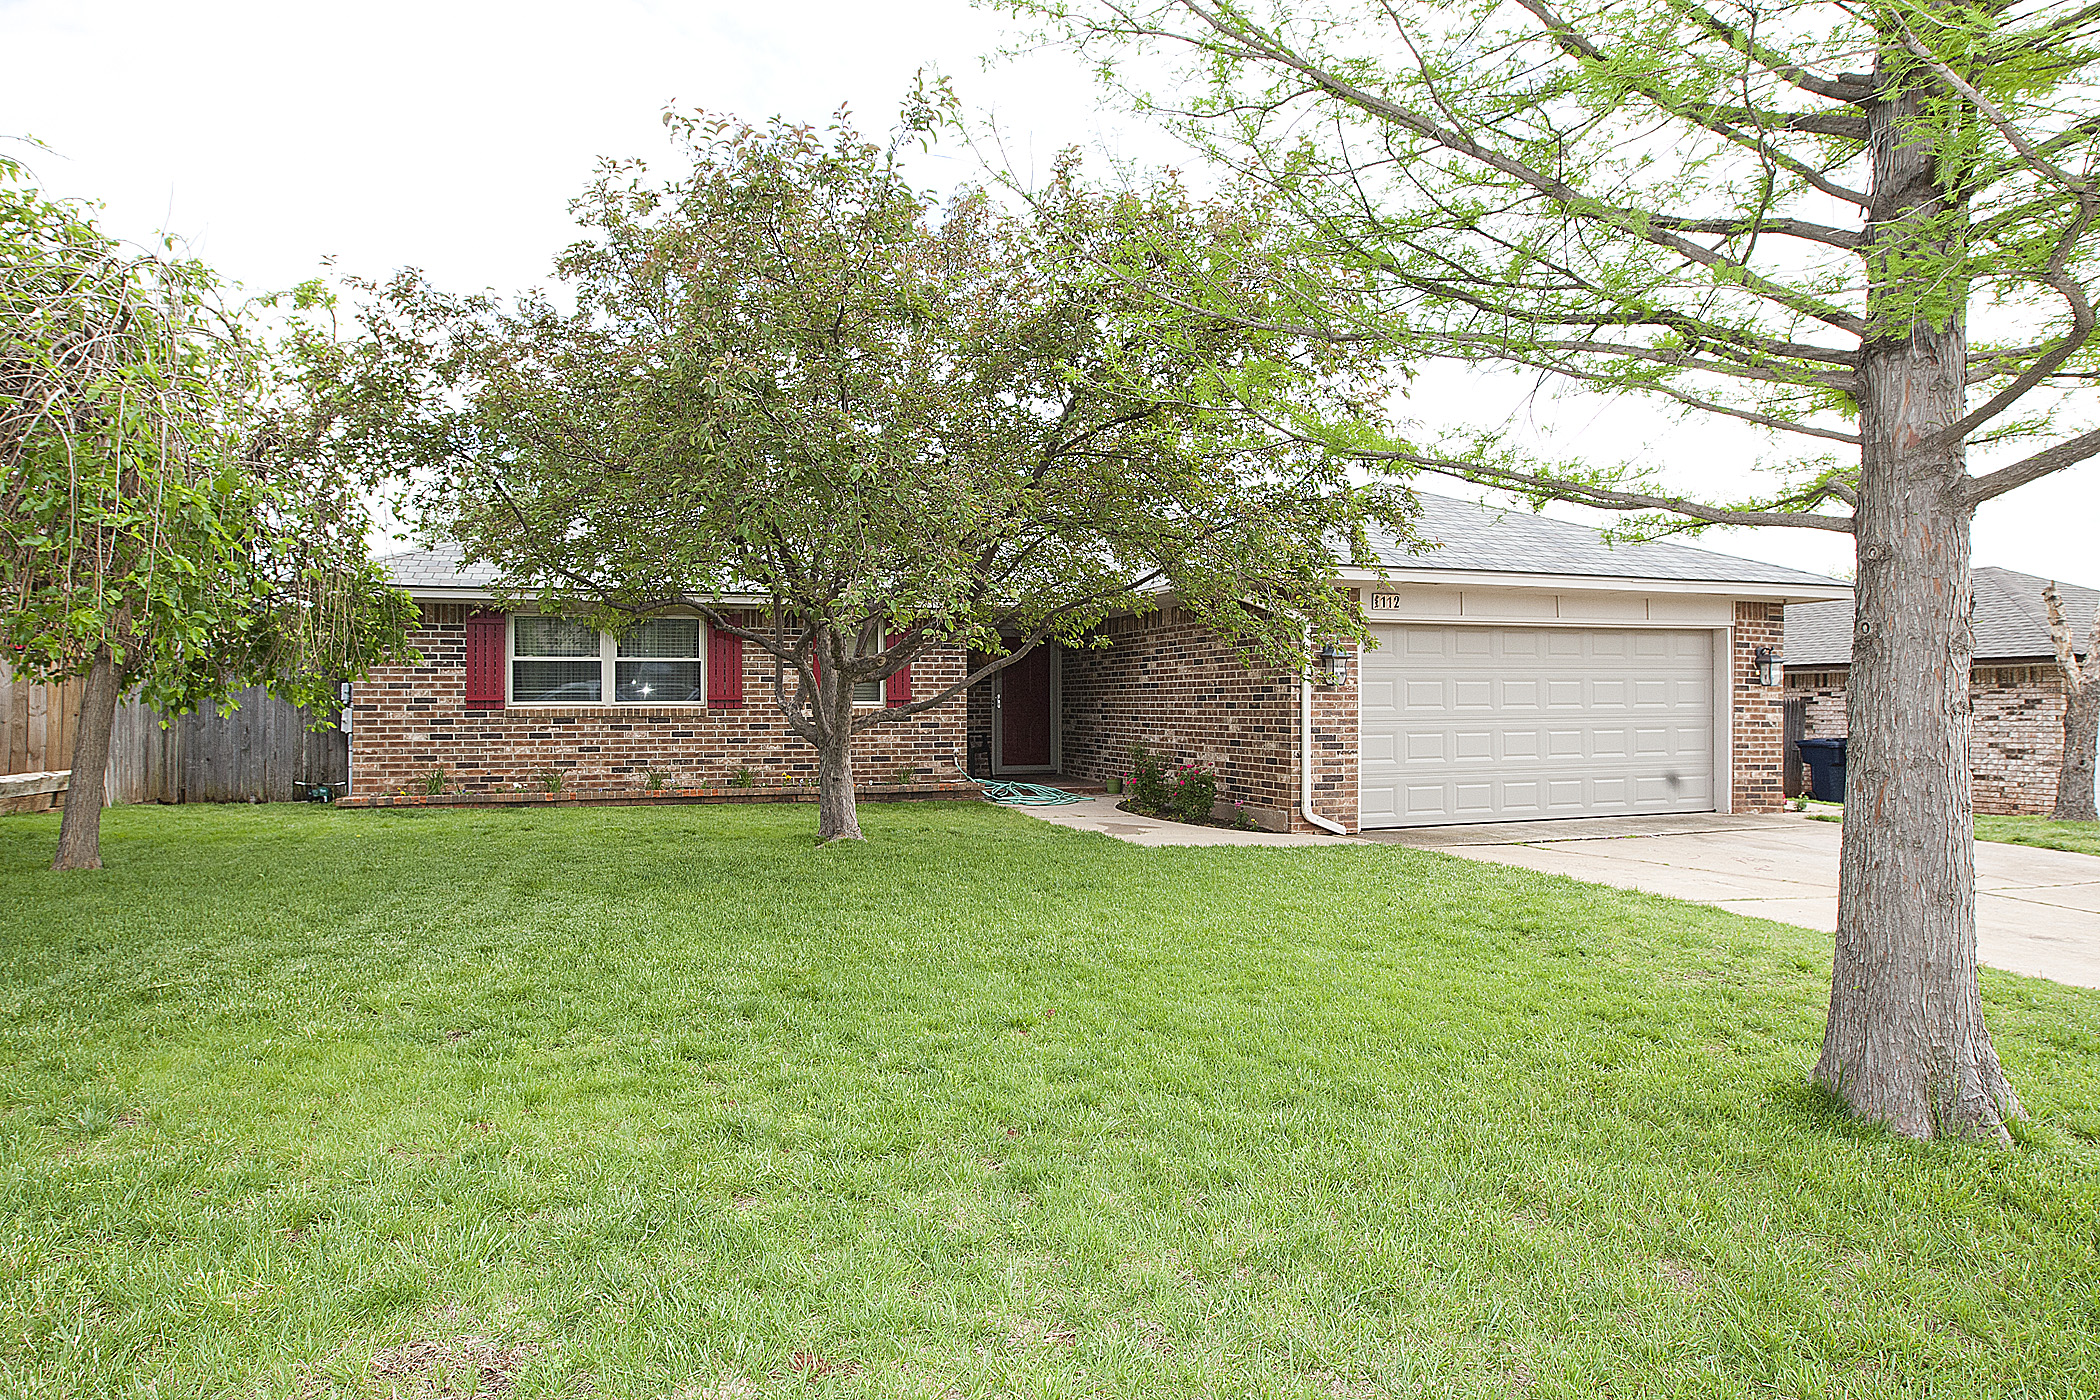 New listing in edmond 192 777 the red team blog Garden homes edmond ok